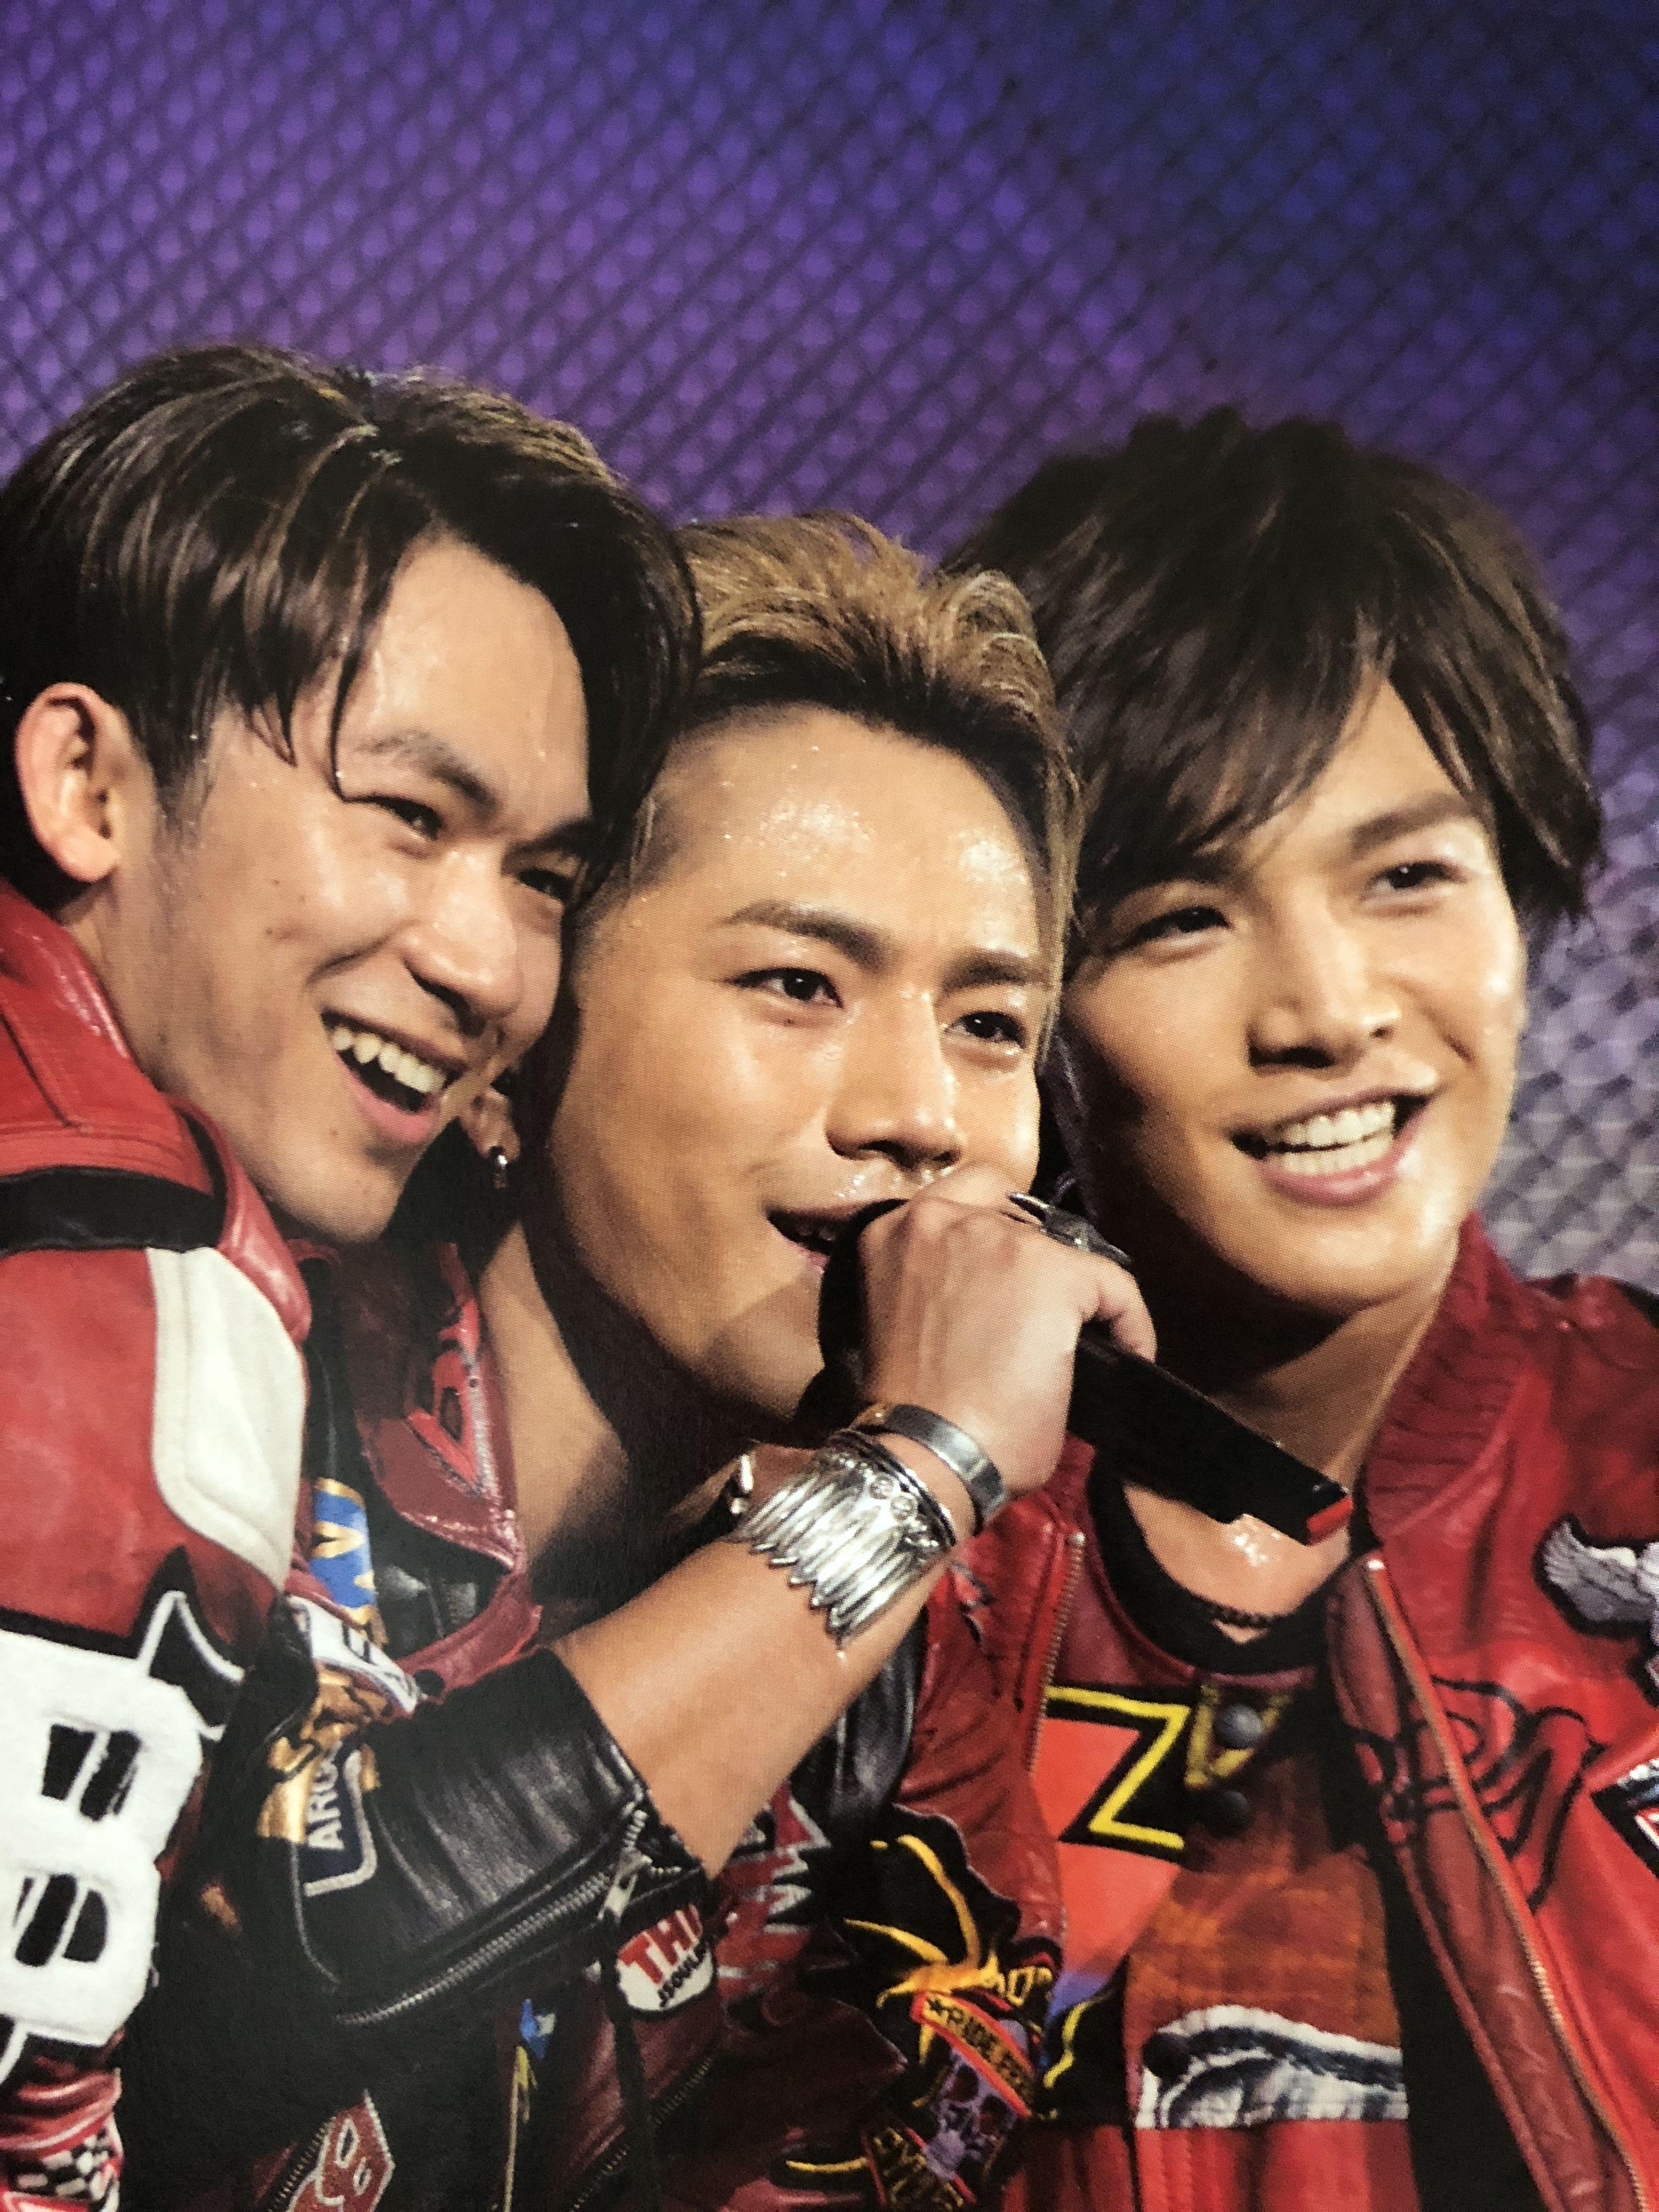 Naoto おしゃれまとめの人気アイデア Pinterest Sakuralady 3代目j Soul Brothers 三代目j Soul Brothers 岩田 剛 典